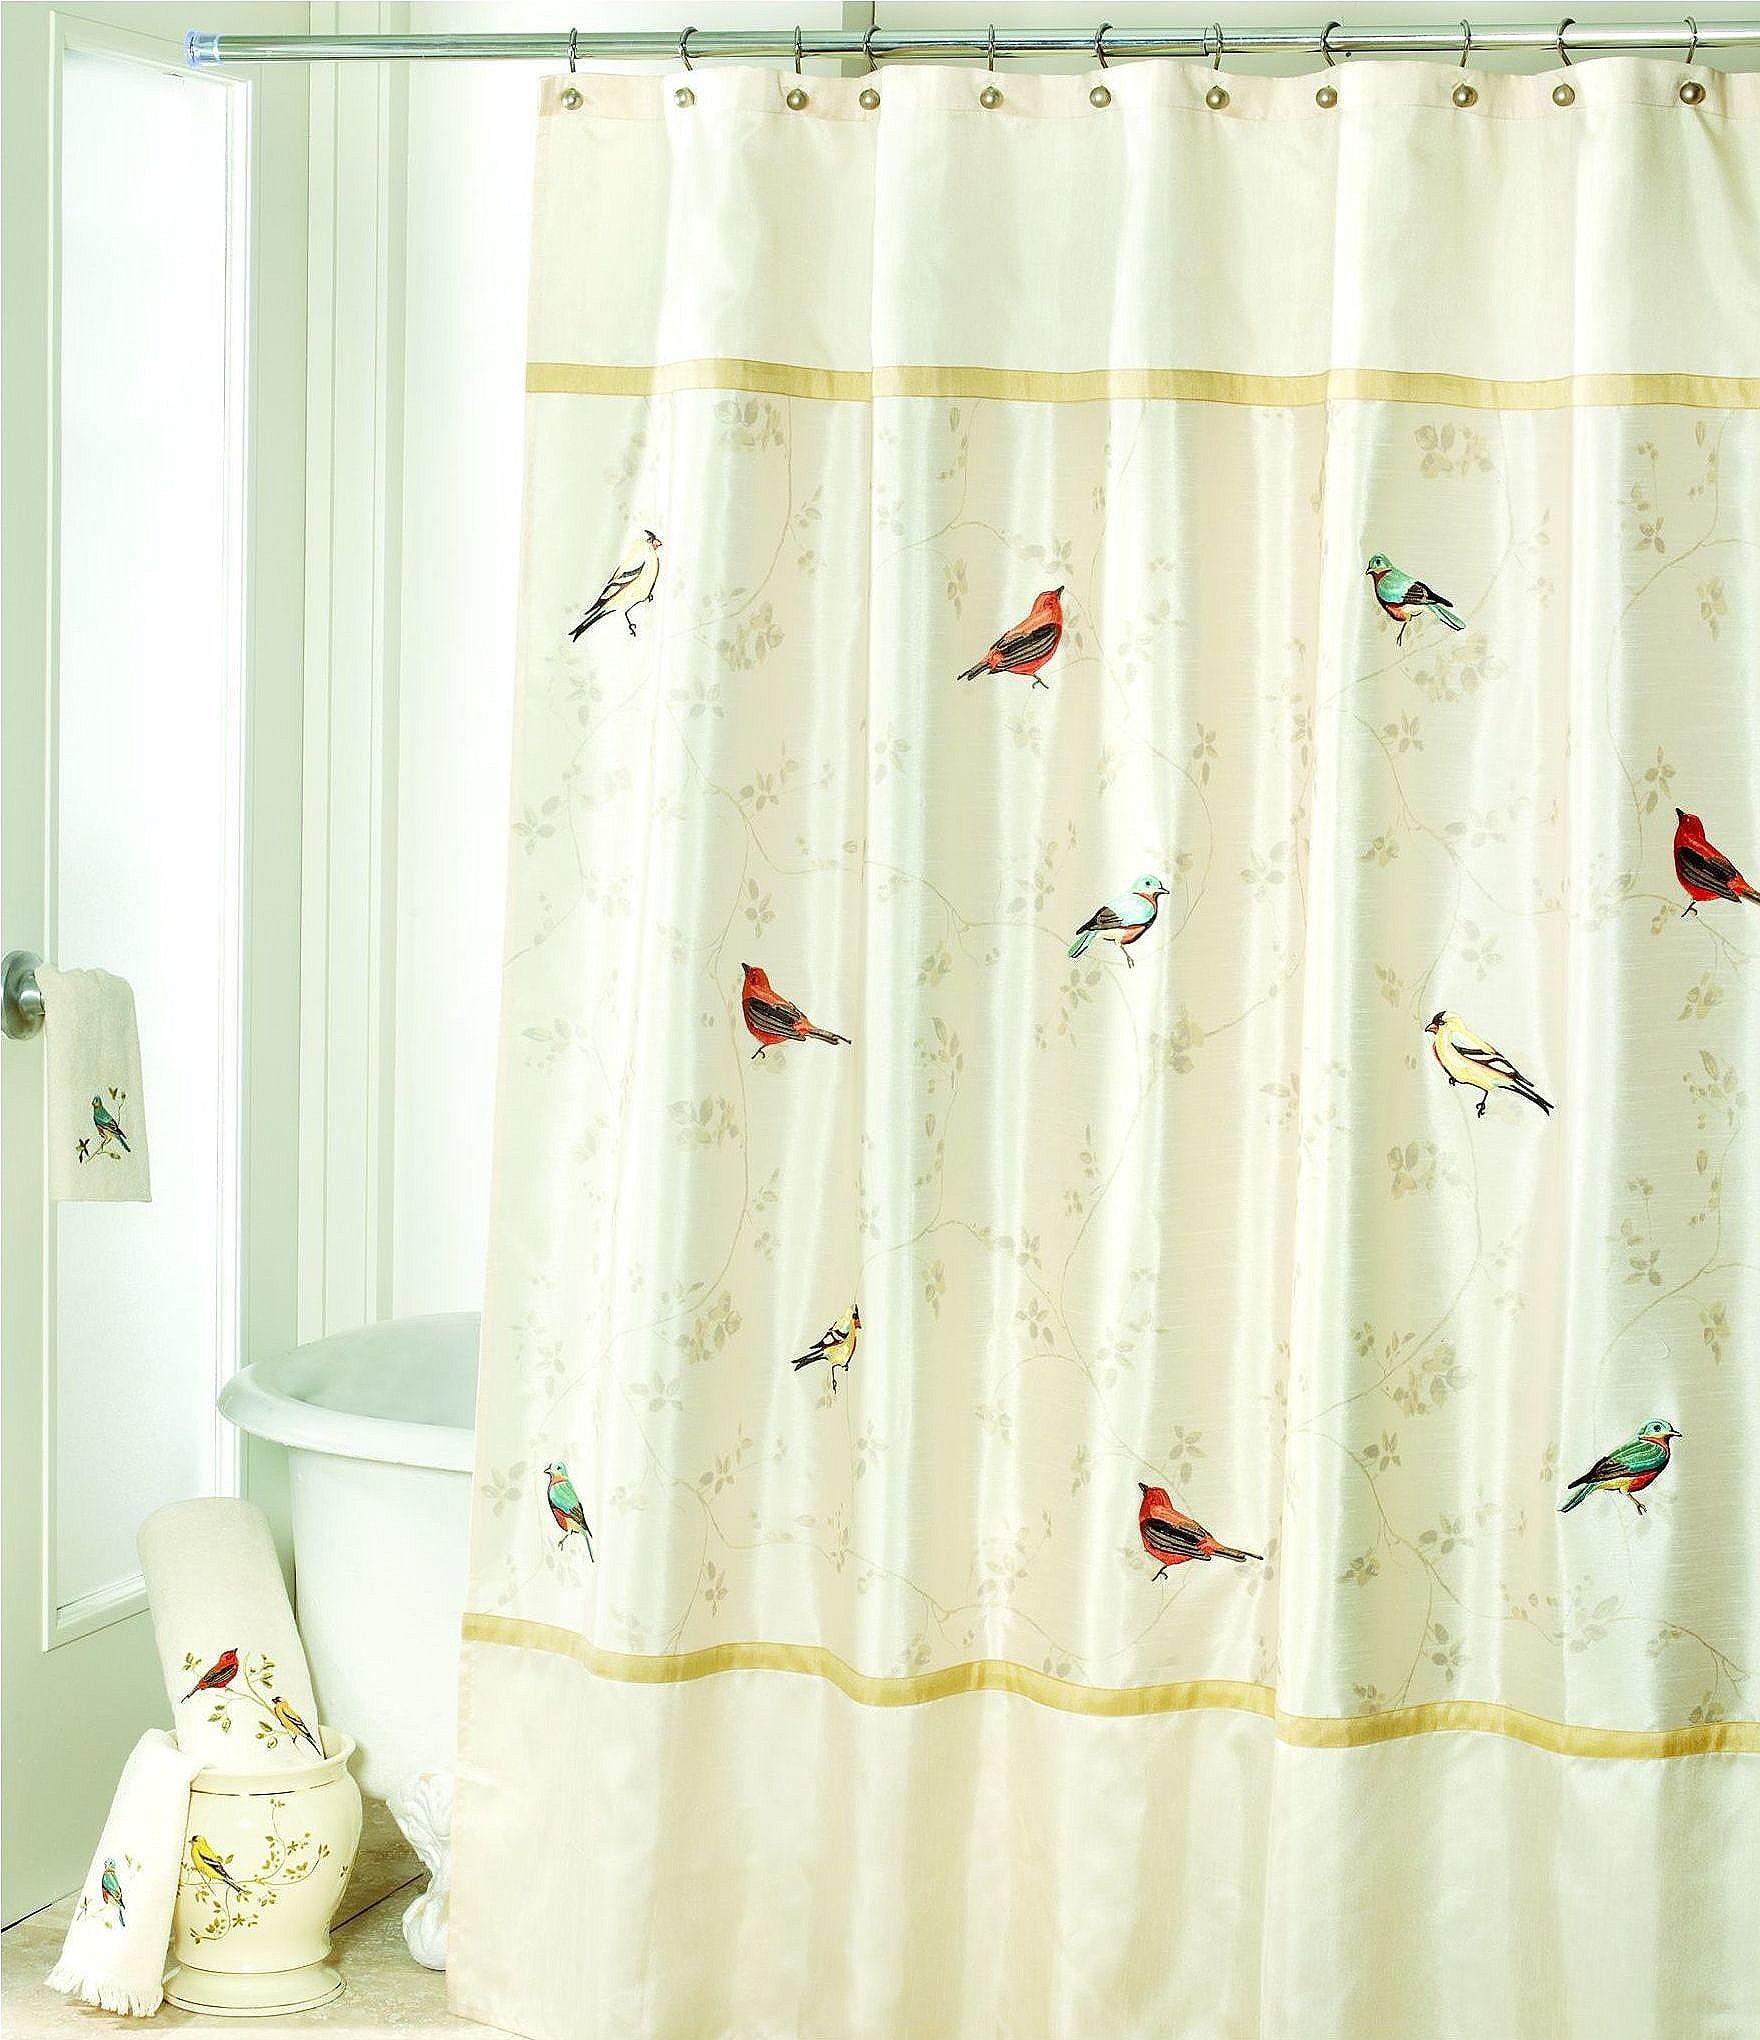 Avanti linens gilded birds shower curtain dillard 39 s for Dillards bathroom accessories sets